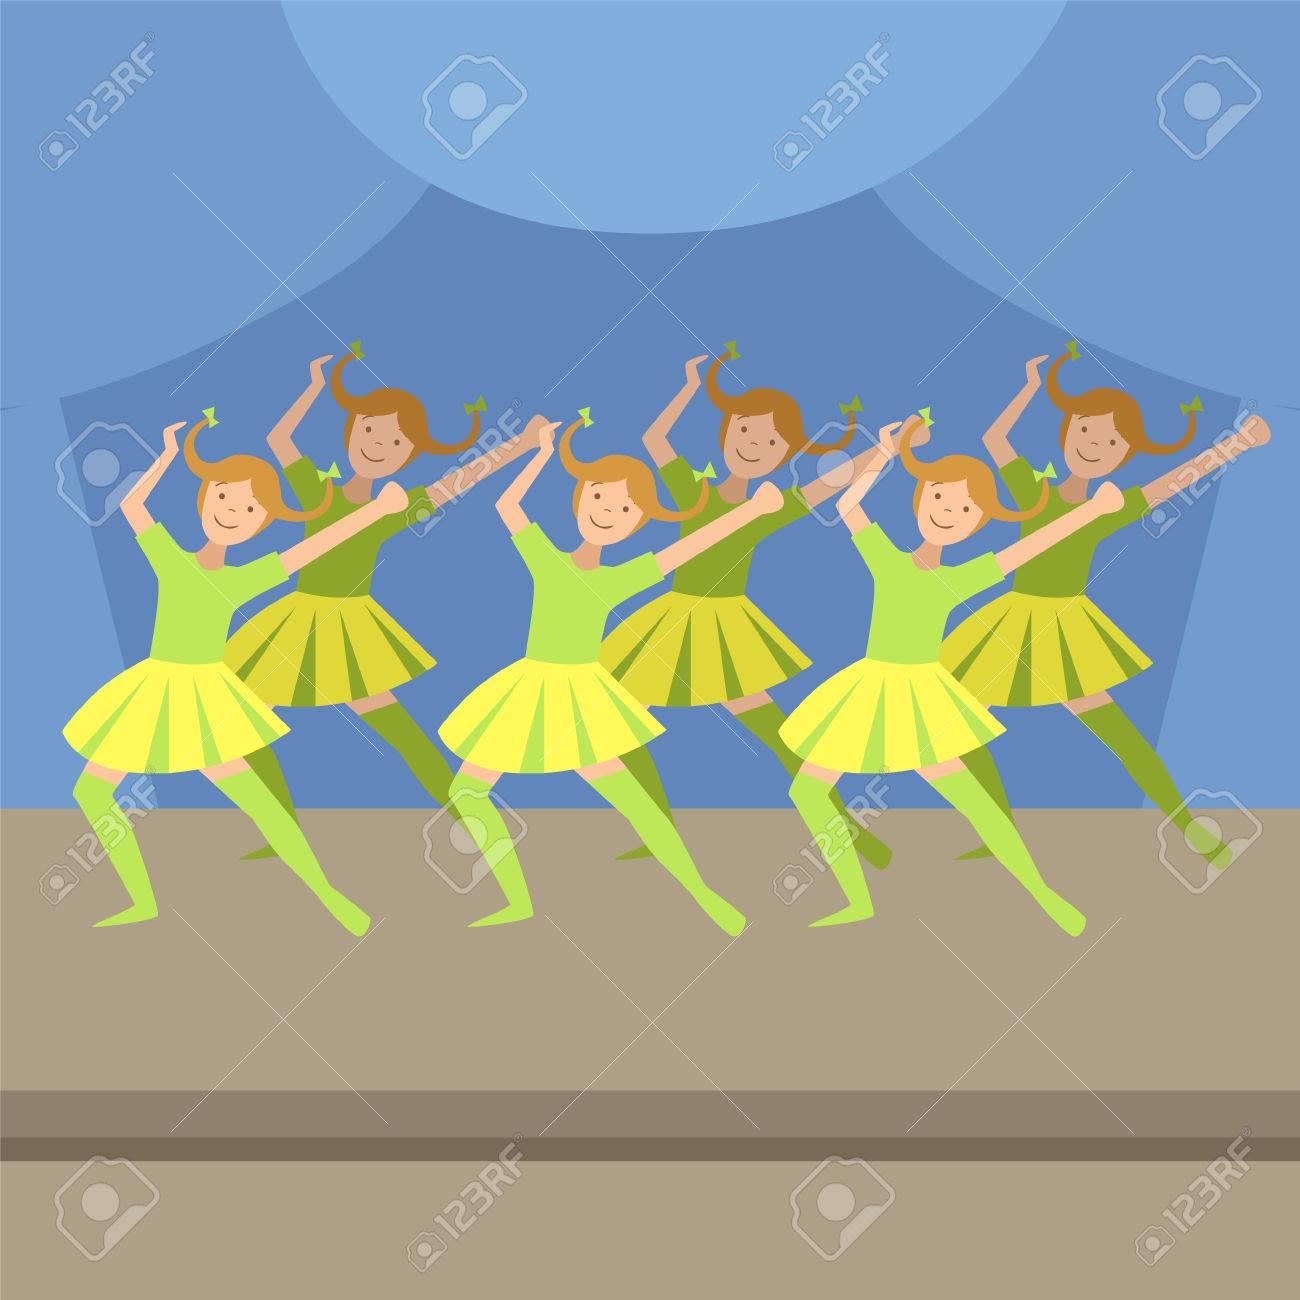 Enfants Synchronisee Spectacle De Danse Moderne Simplifie Dessin